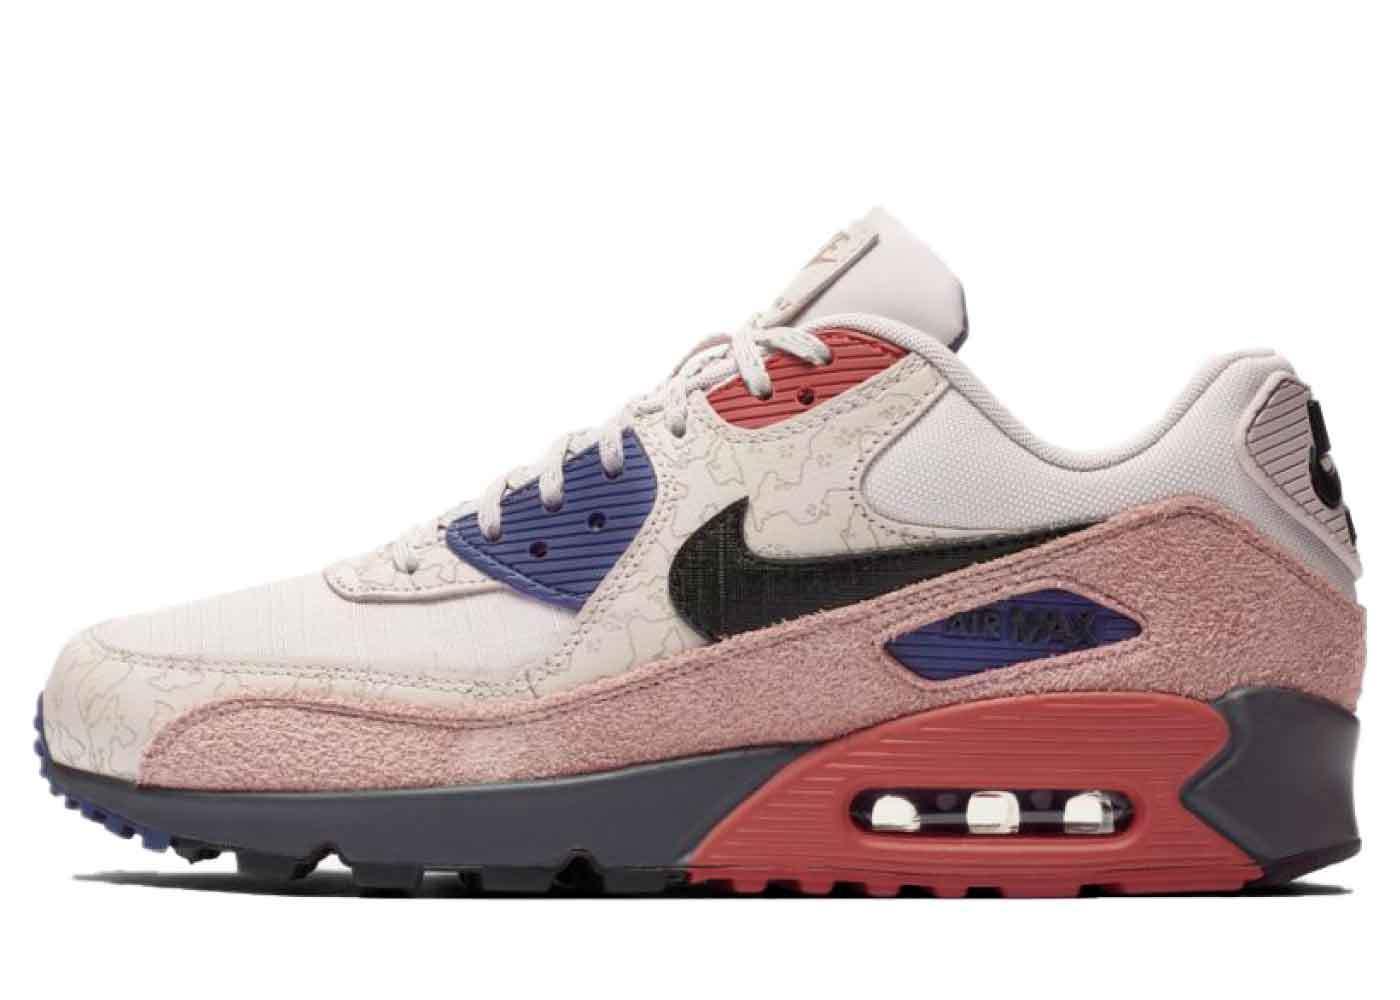 Nike Air Max 90 Camowabbの写真